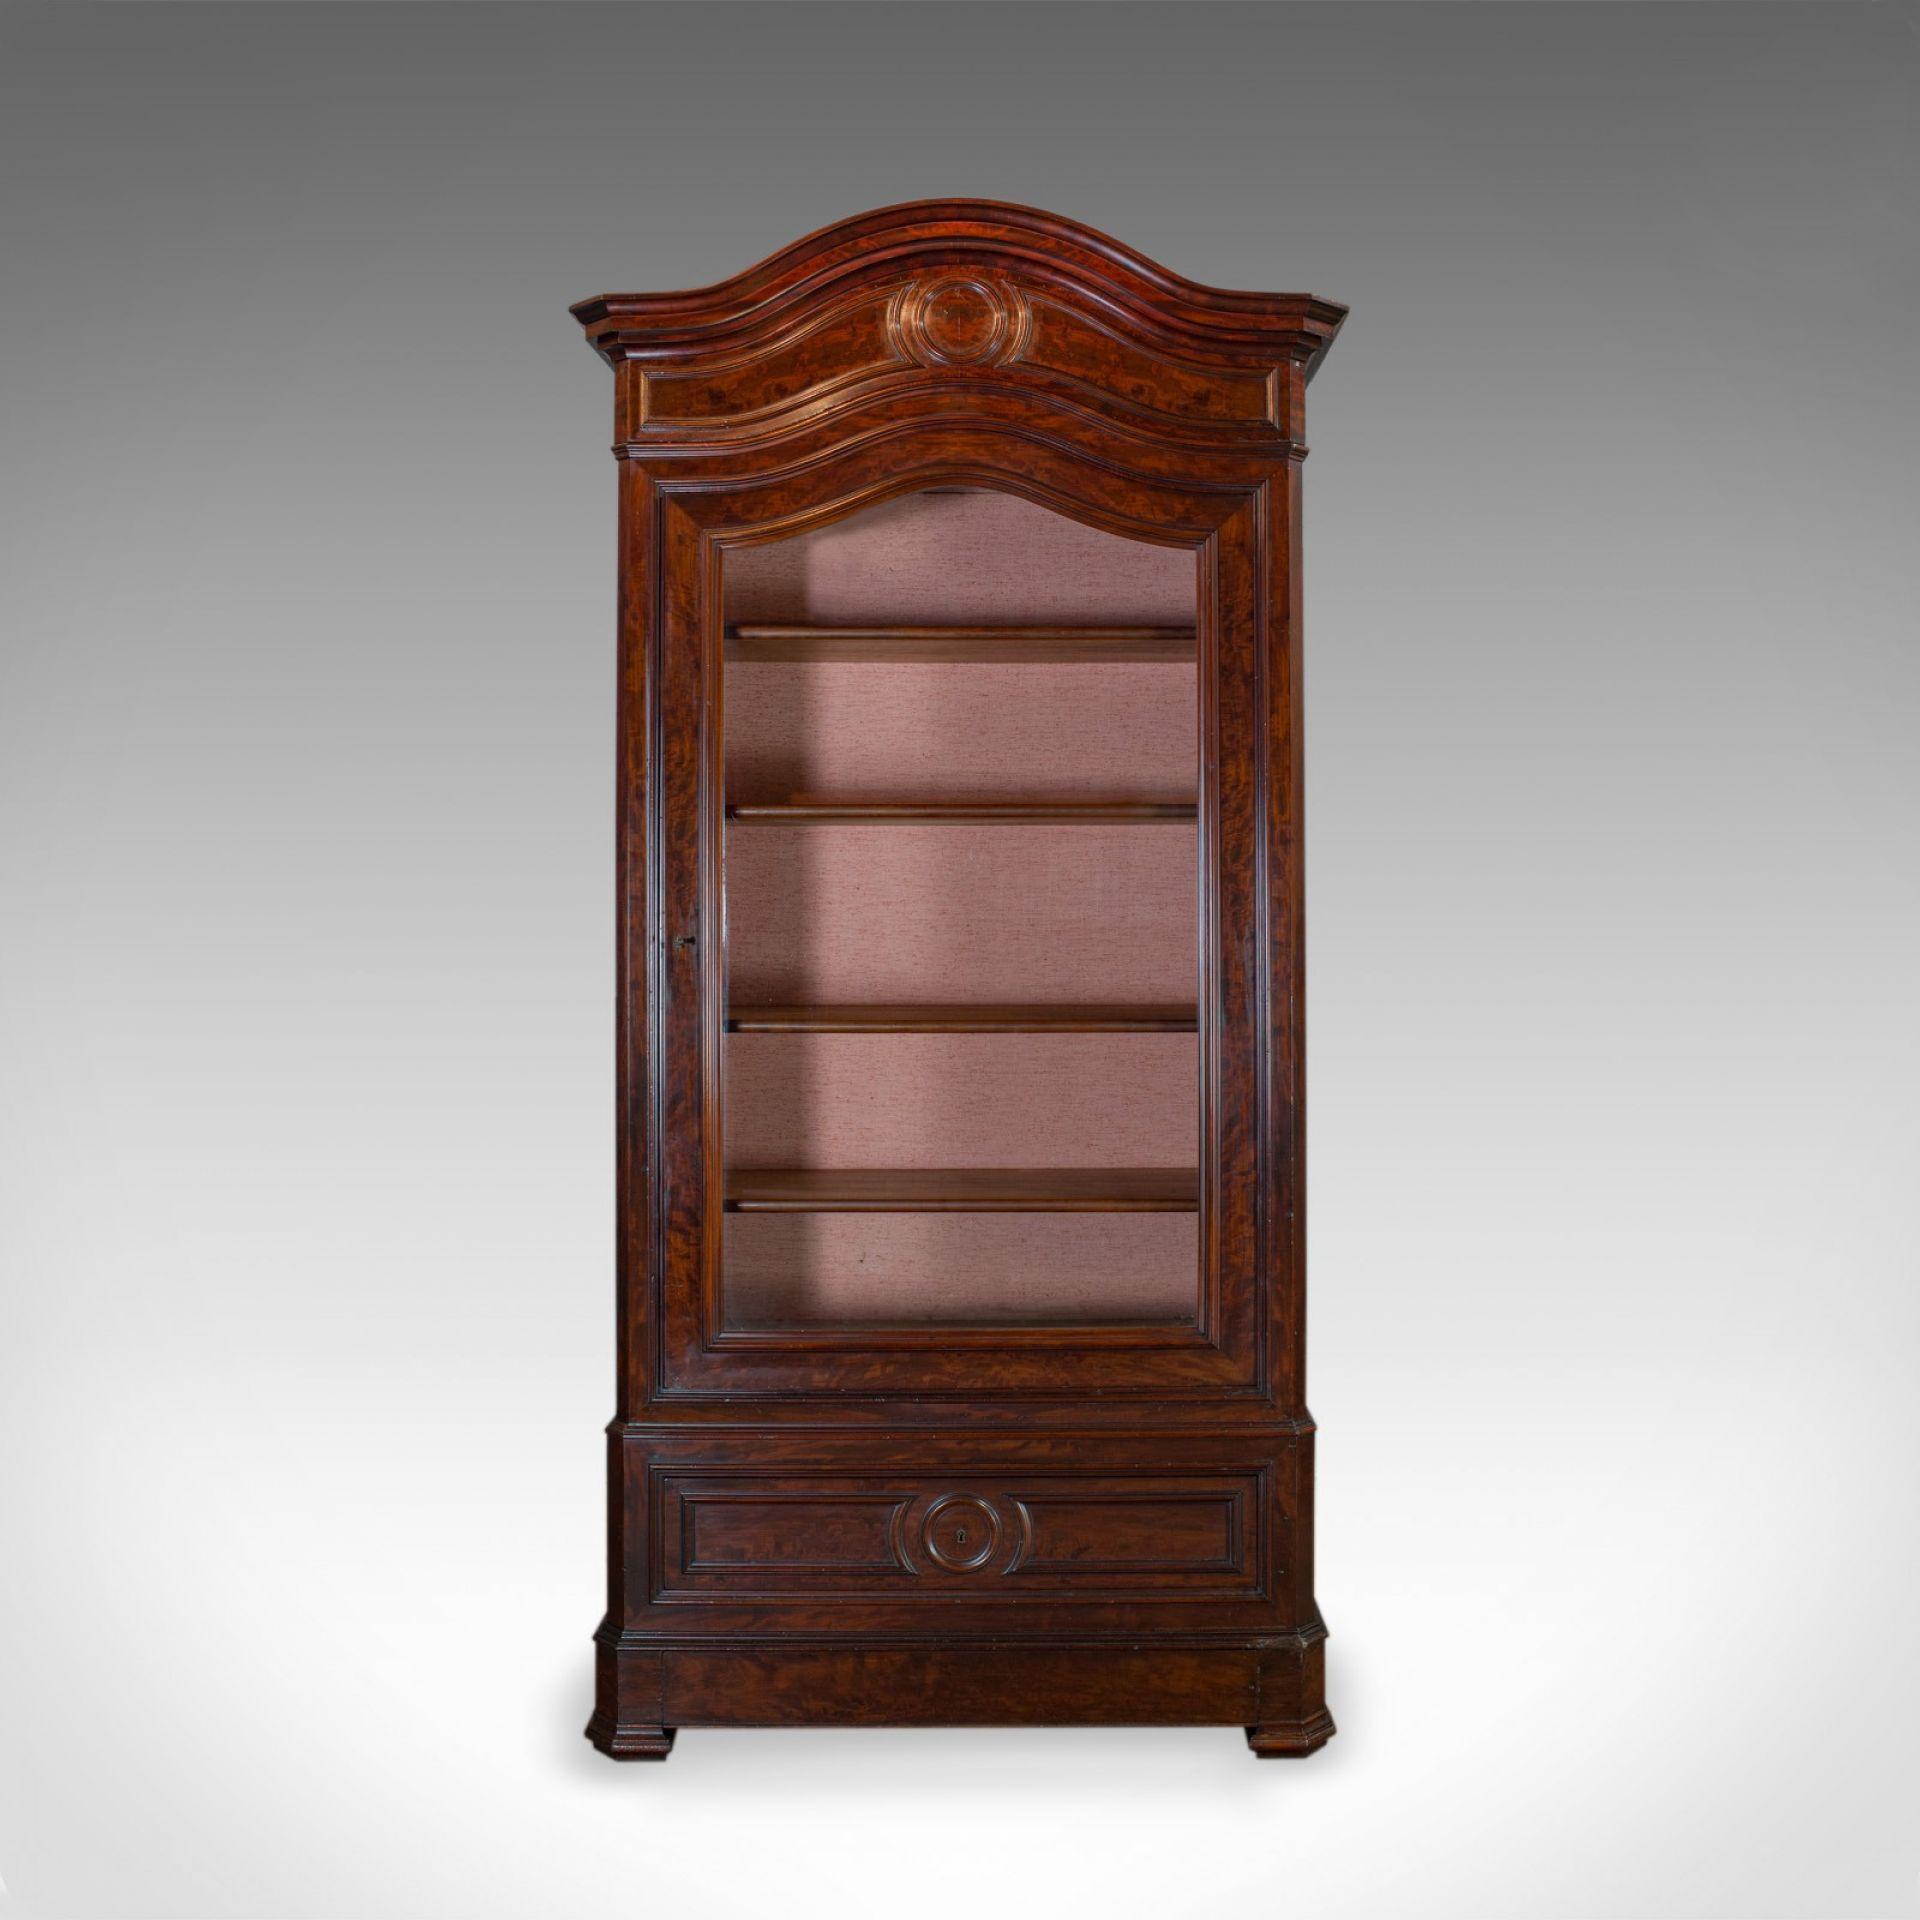 Antique Display Cabinet, Victorian, Flame Mahogany Vitrine, Circa 1850